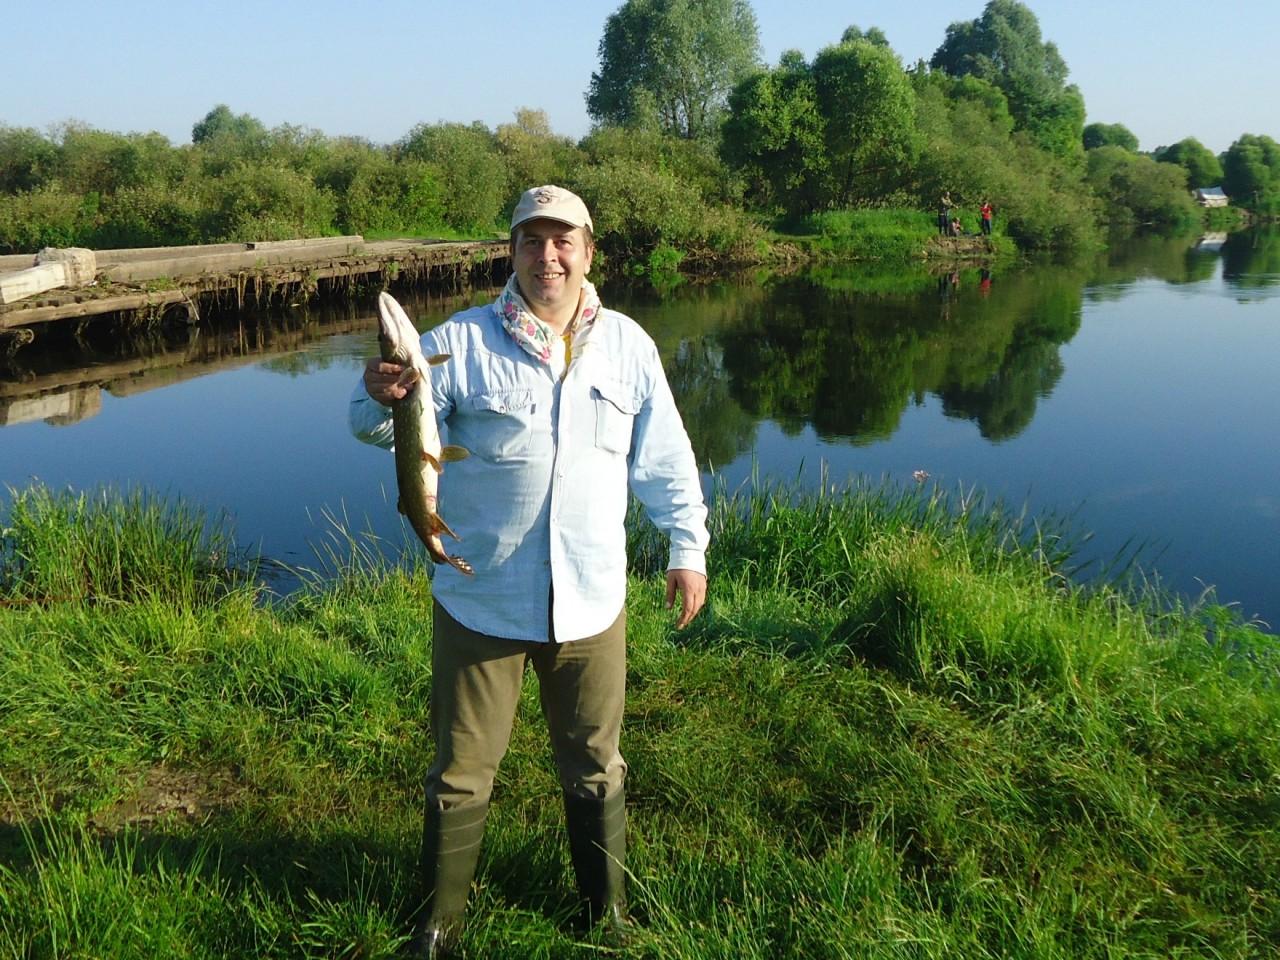 охота рыбалка туризм брянск